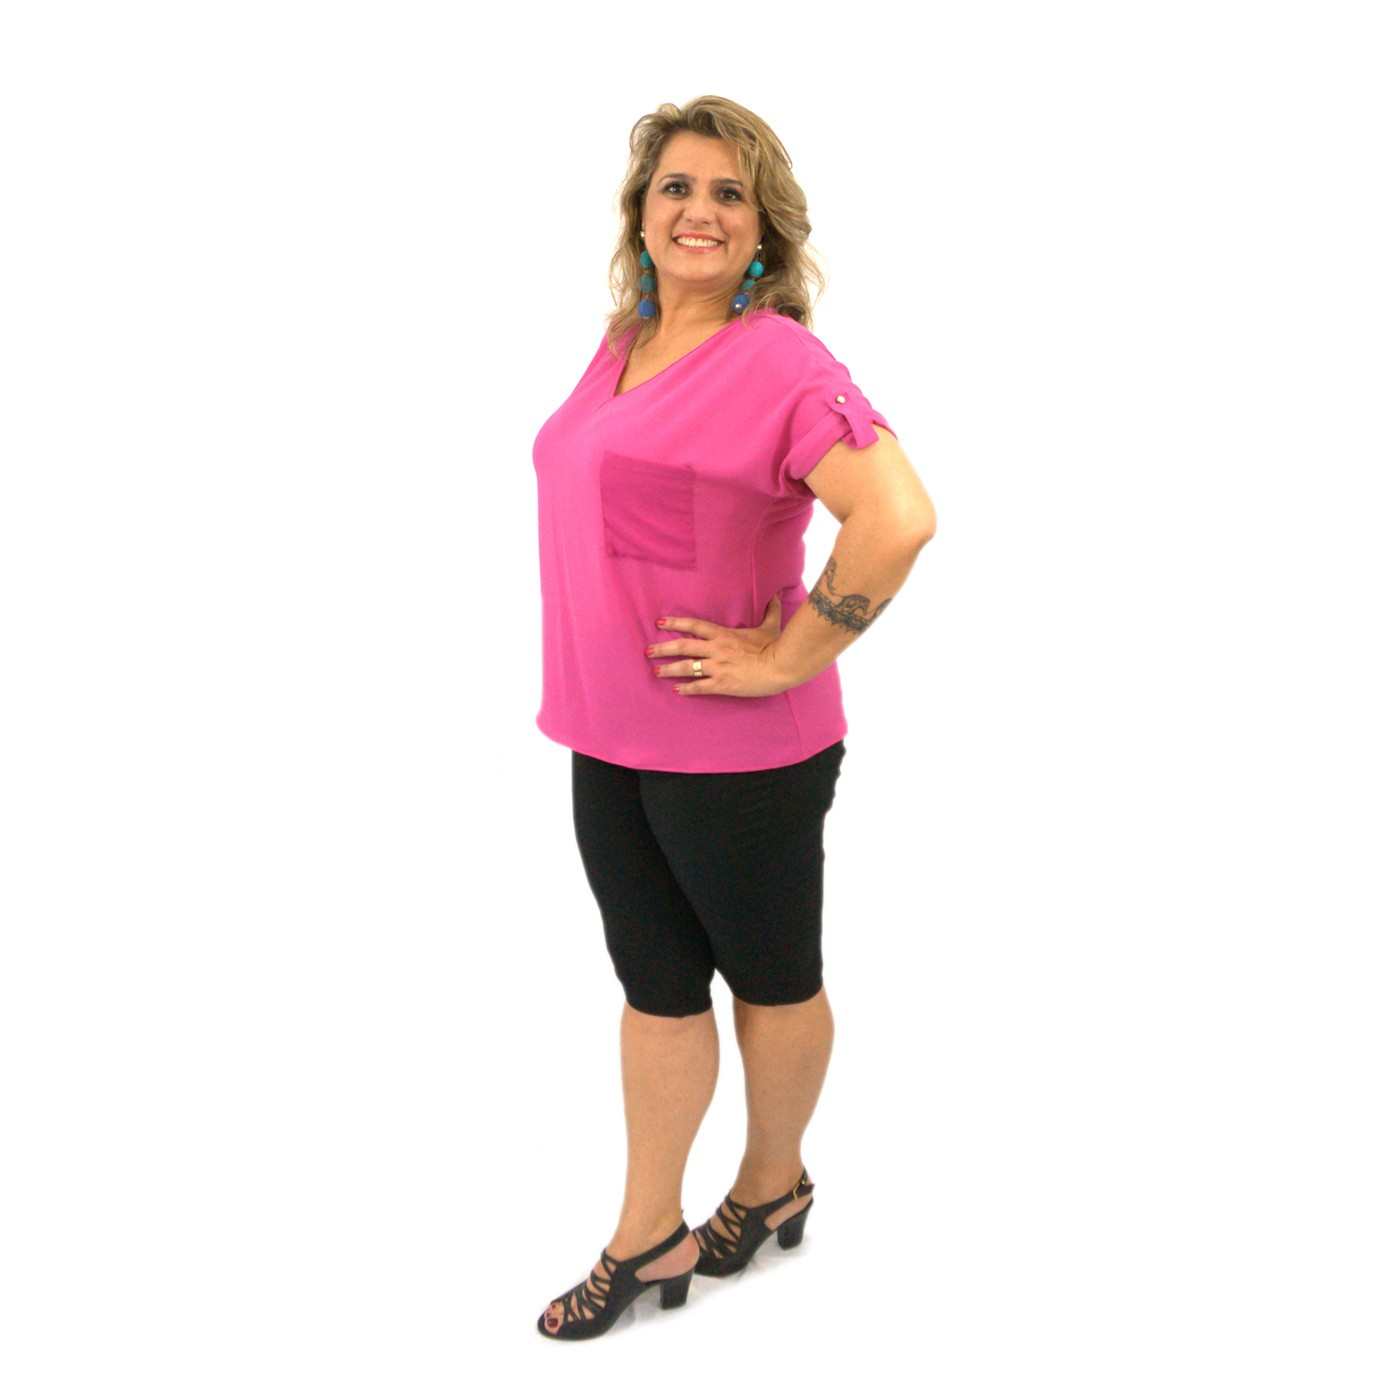 Blusinha Plus Size Manga Curta Tipo Camiseta Crepe Pink